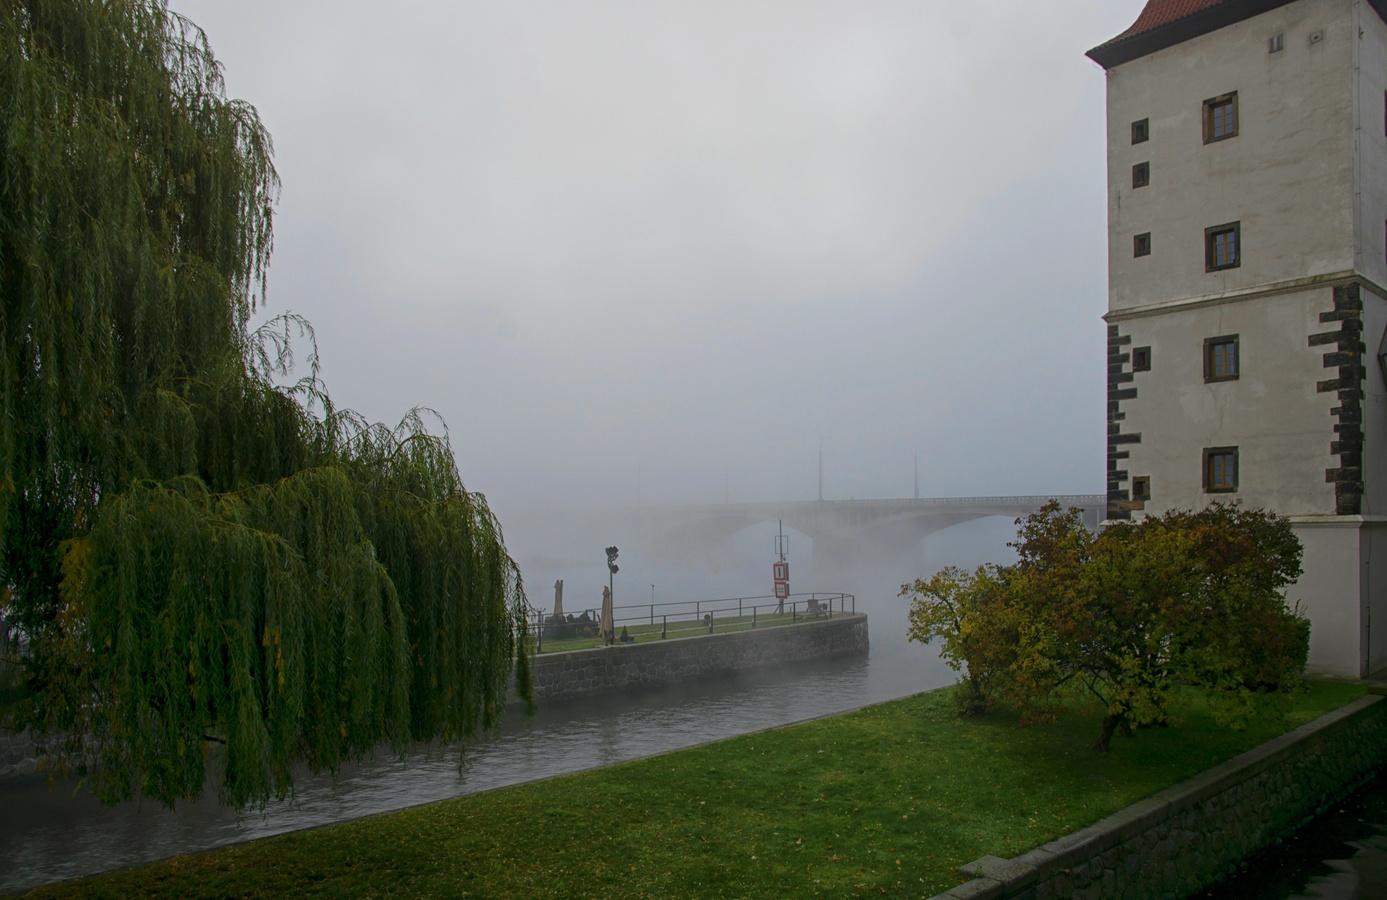 Ráno u Vltavy